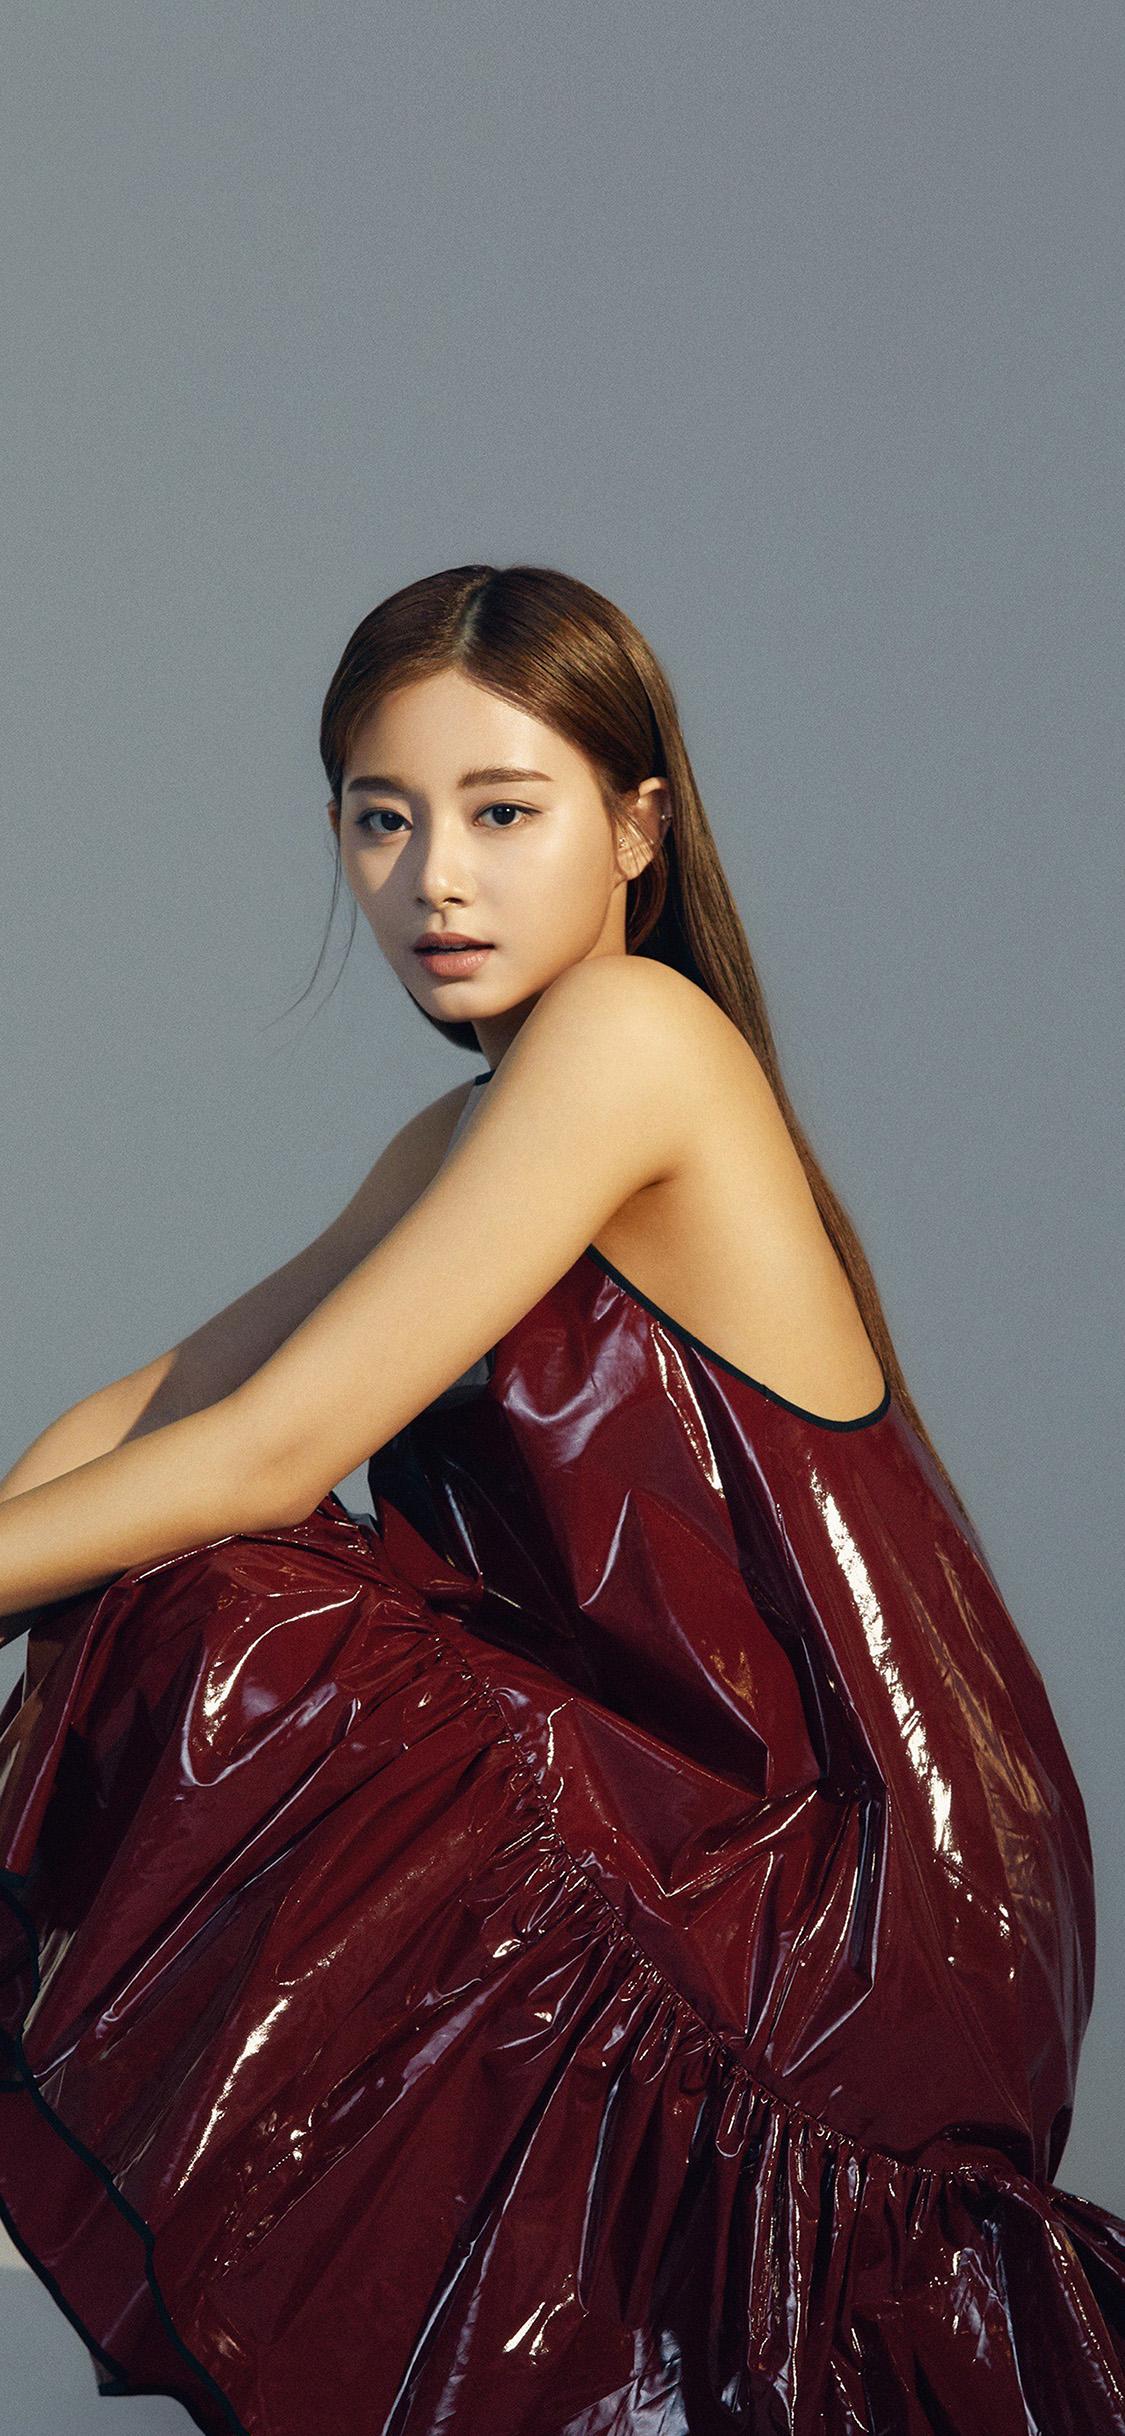 iPhonexpapers.com-Apple-iPhone-wallpaper-hs23-kpop-girl-tzuyu-twice-dress